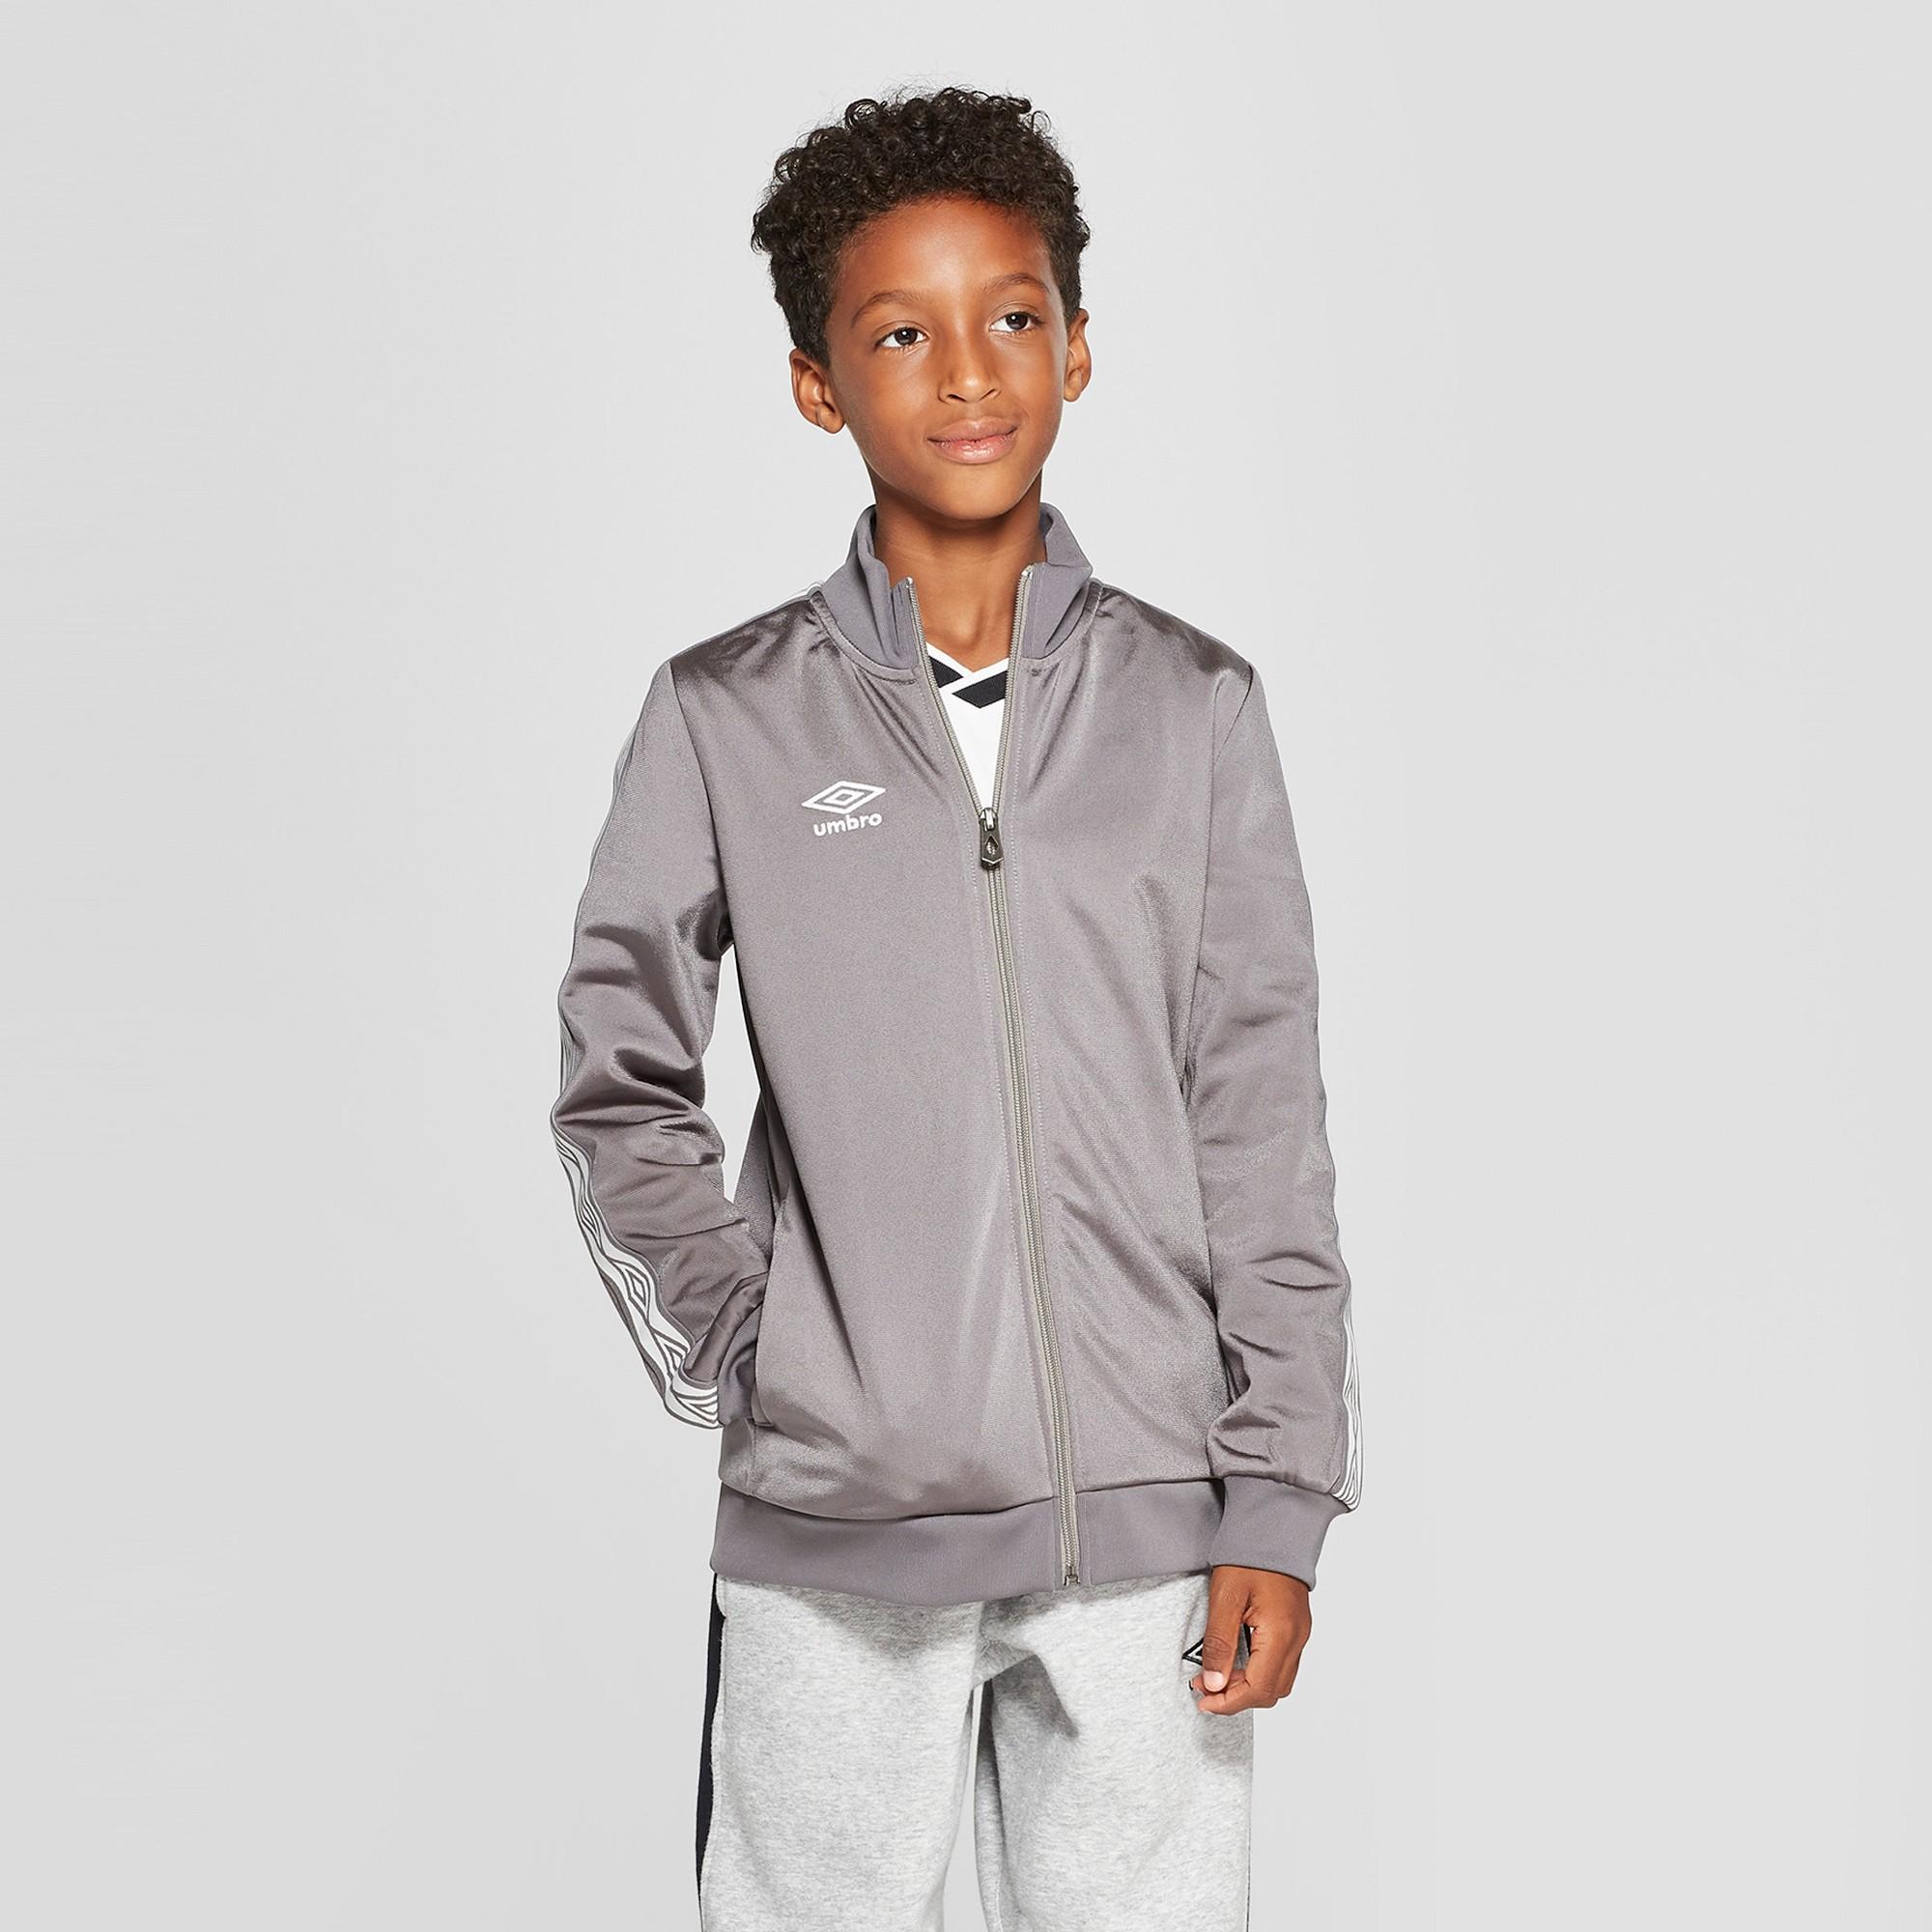 Umbro Boys' Double Diamond Track Jacket - Gray XS